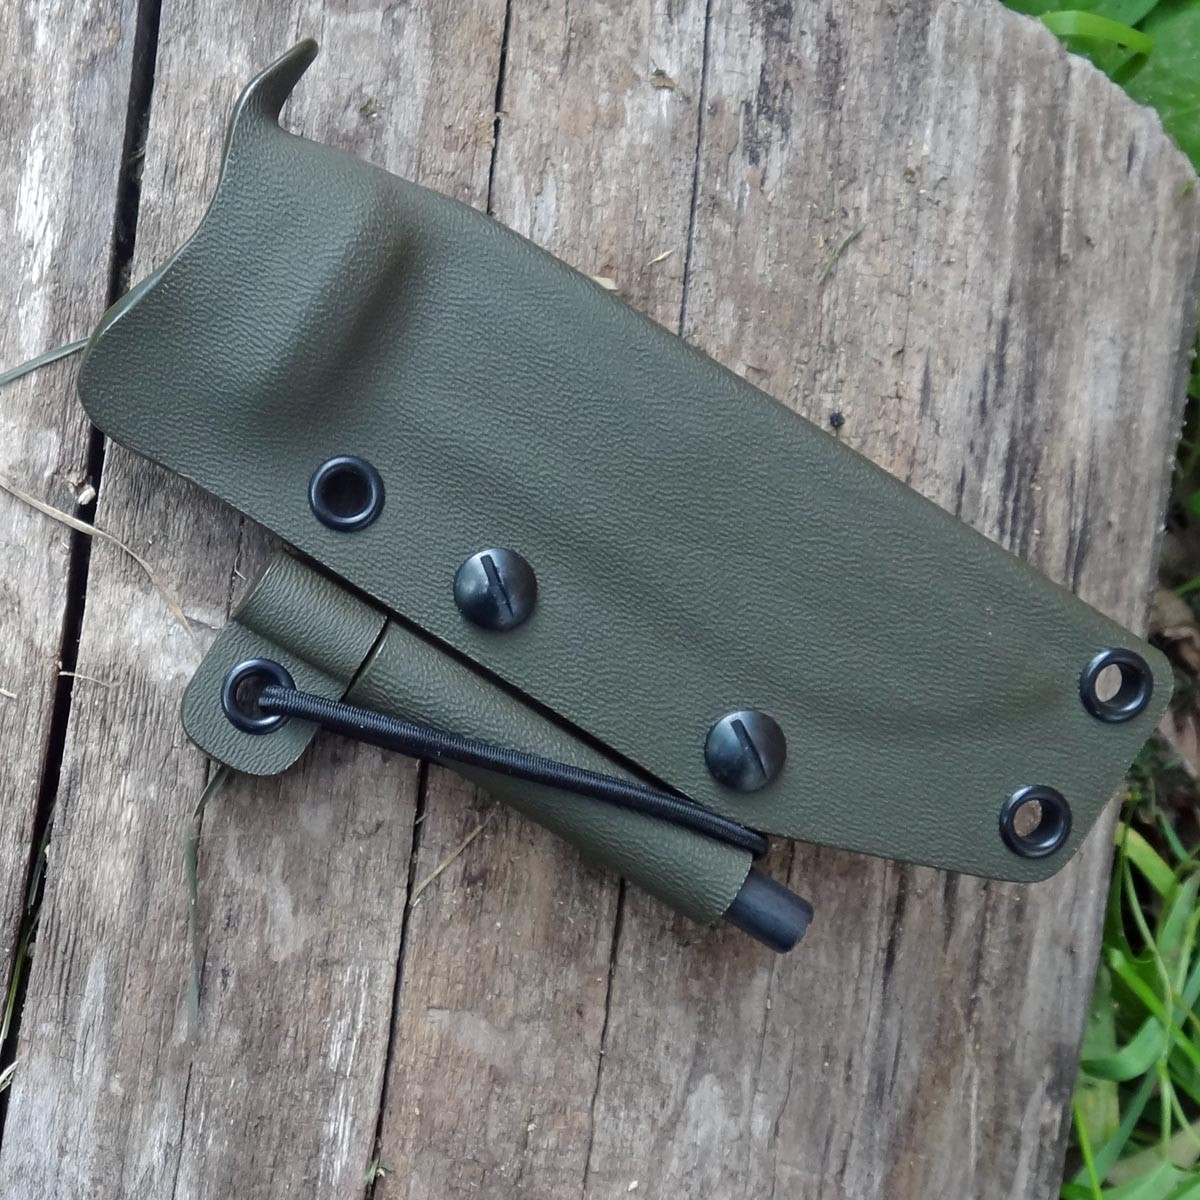 Kydex Knife Sheath: Foldover Custom Kydex Sheath